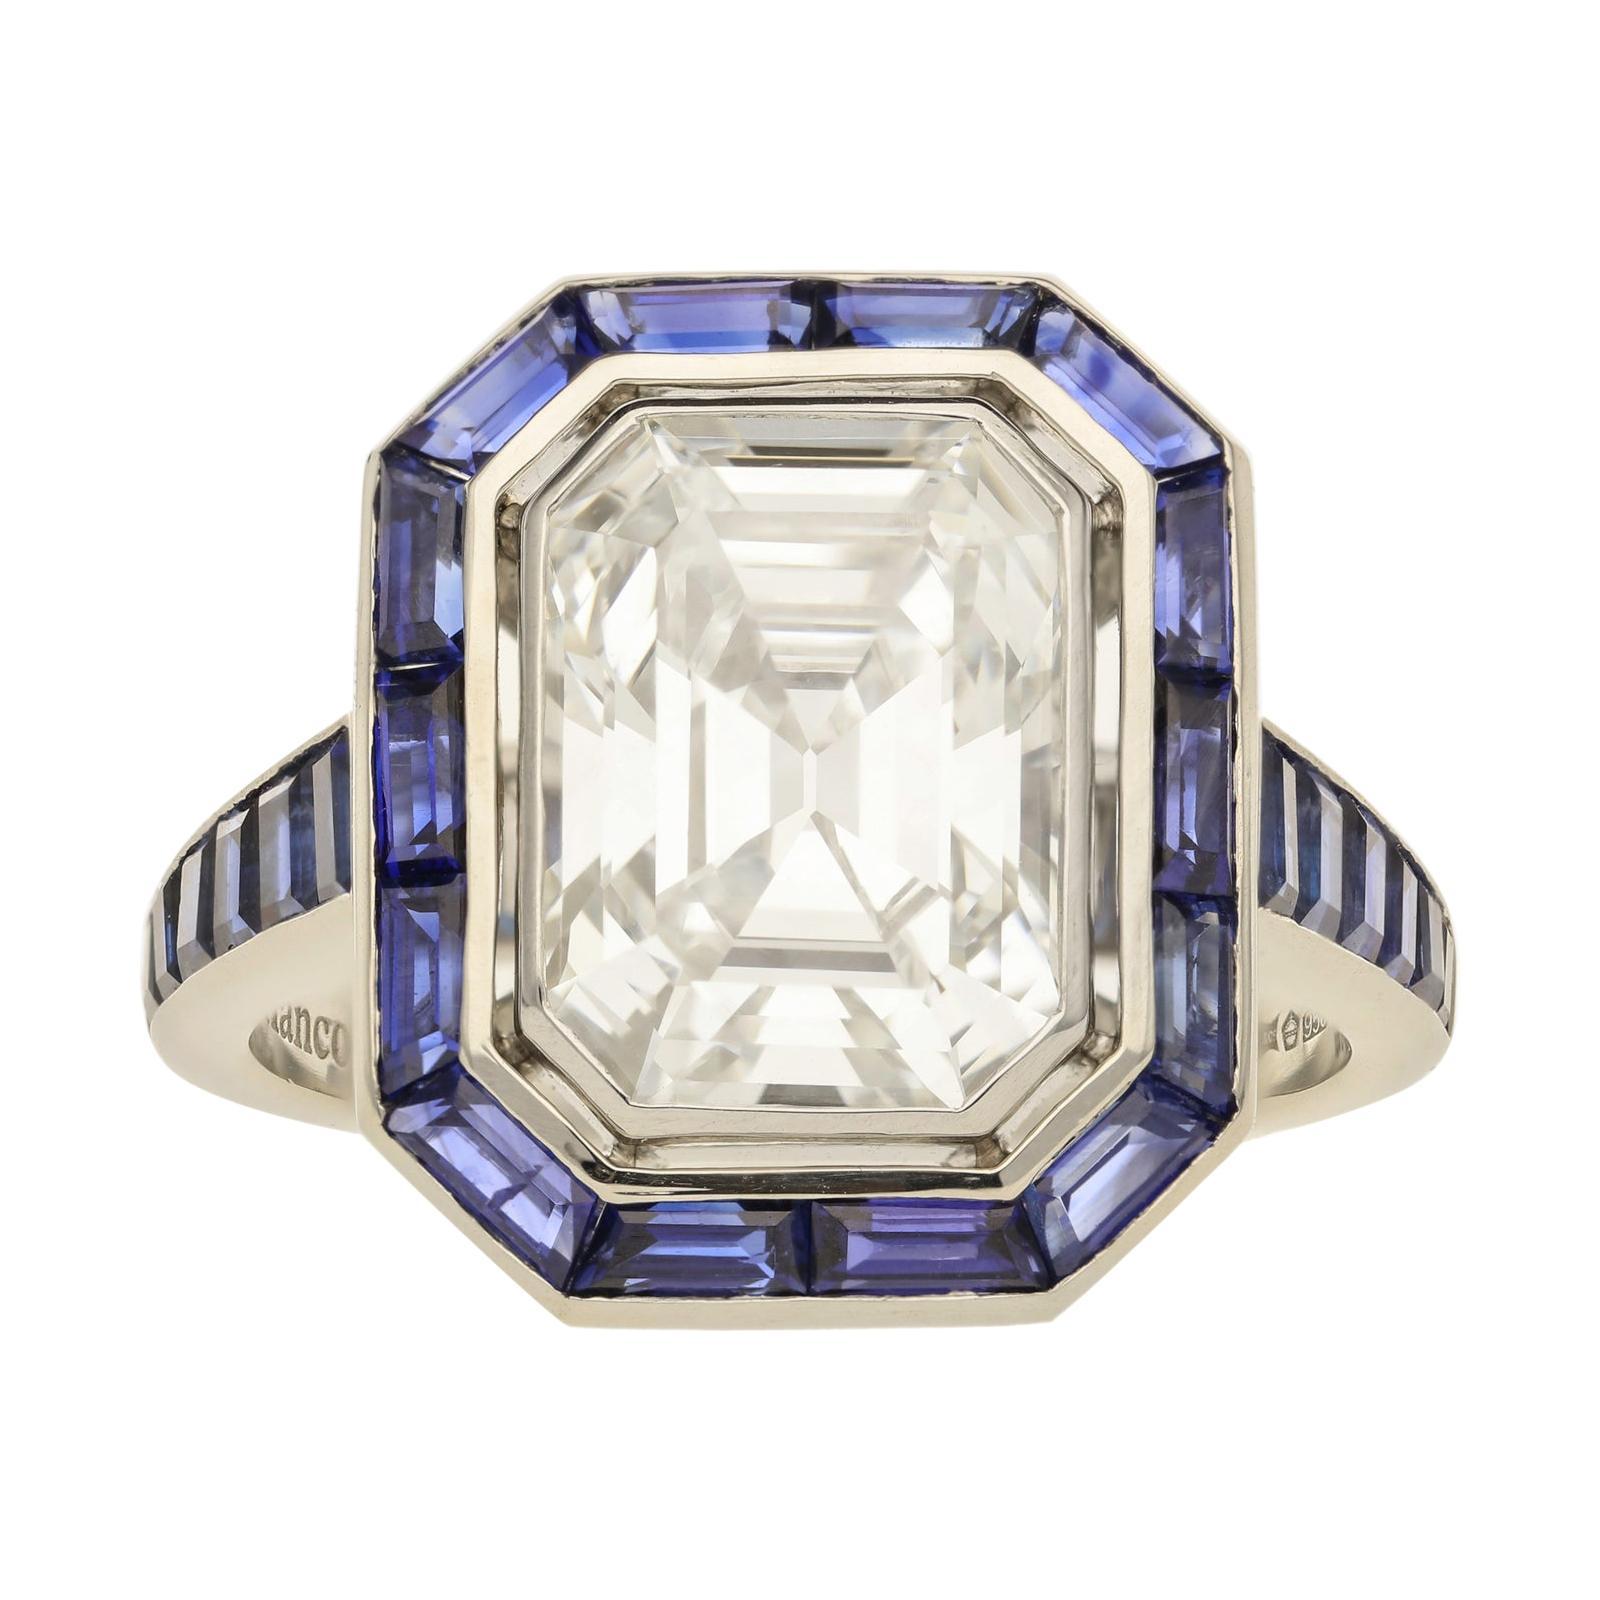 3.10 Carat G SI1 Emerald Cut Diamond & Calibre-Cut Sapphir Ring by Hancocks